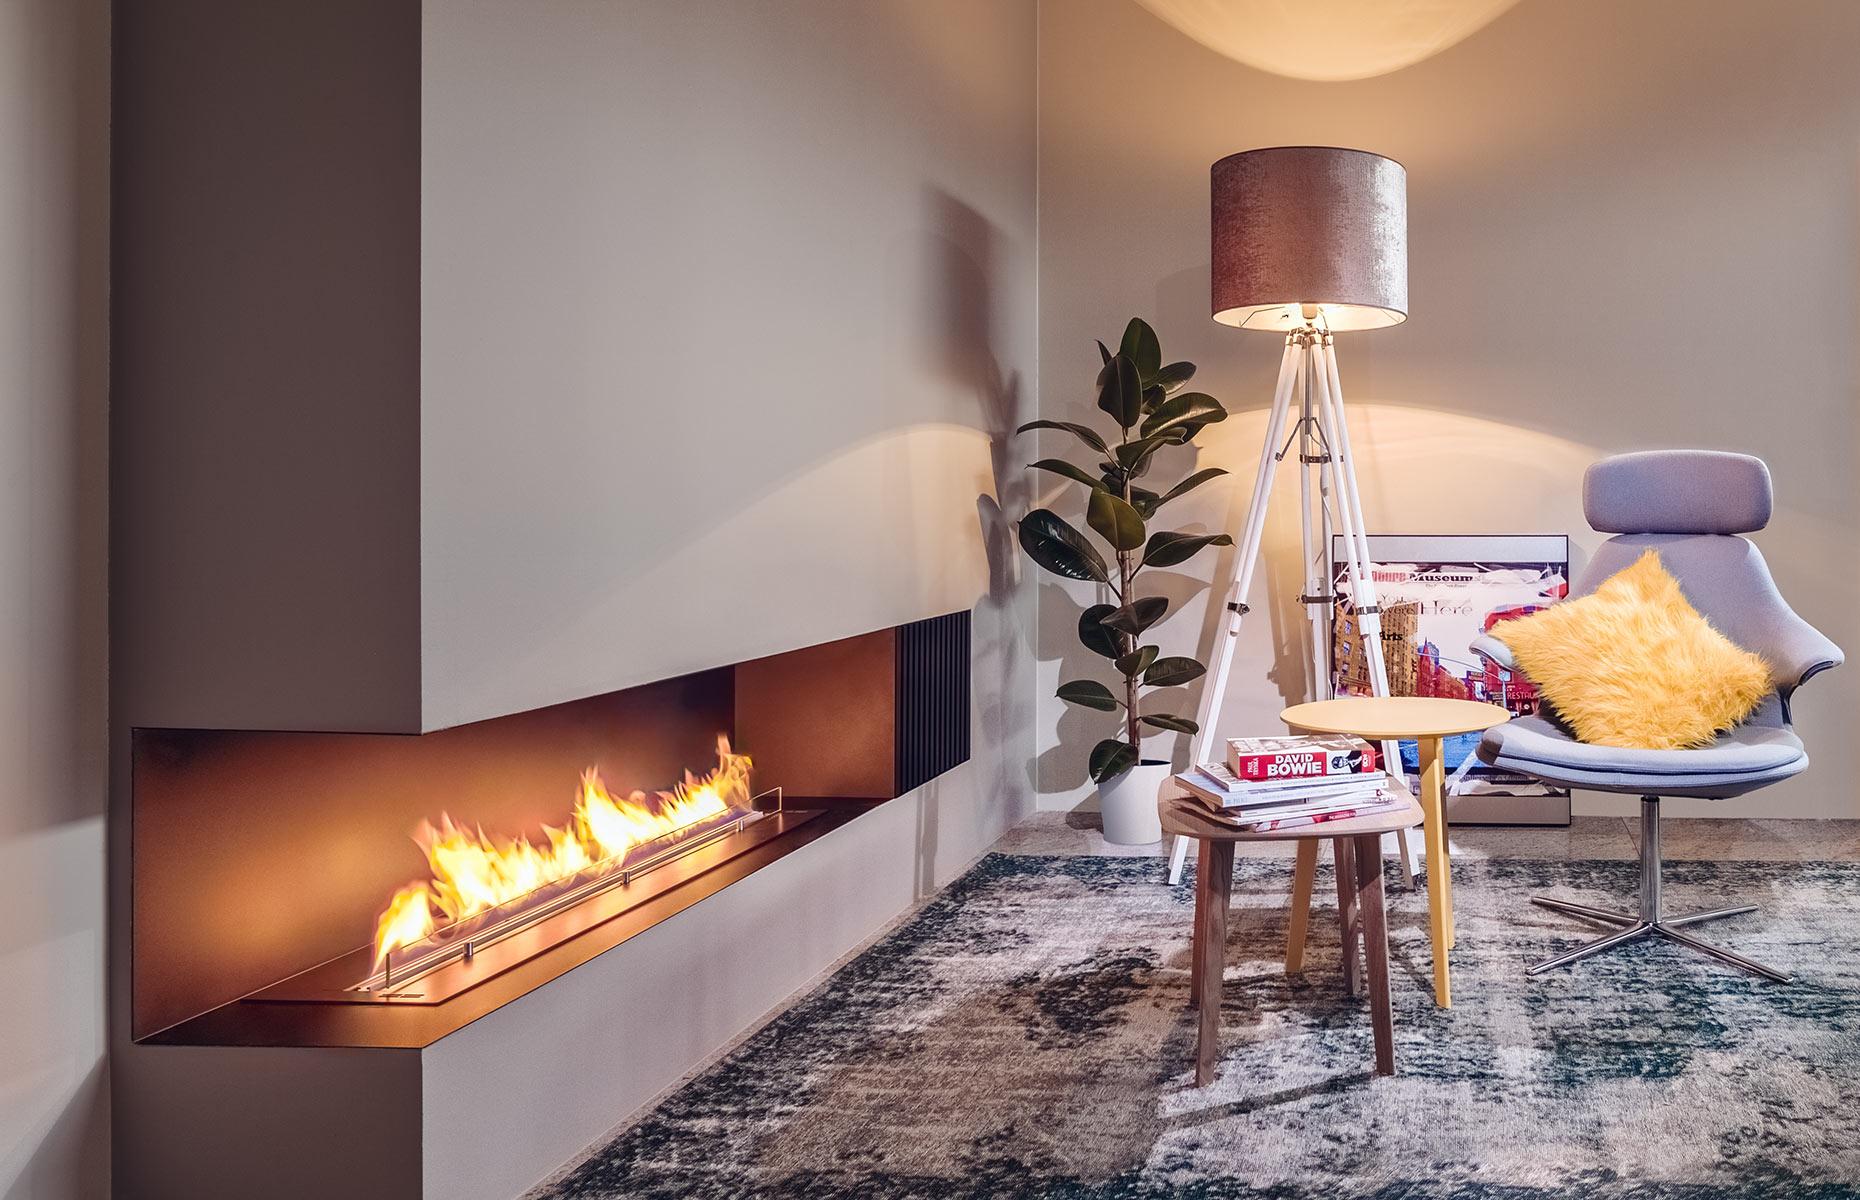 FLA-XT-furniture-from-Living-Art-Studio-Forma-fot.-MichaI-Kugacz[1]